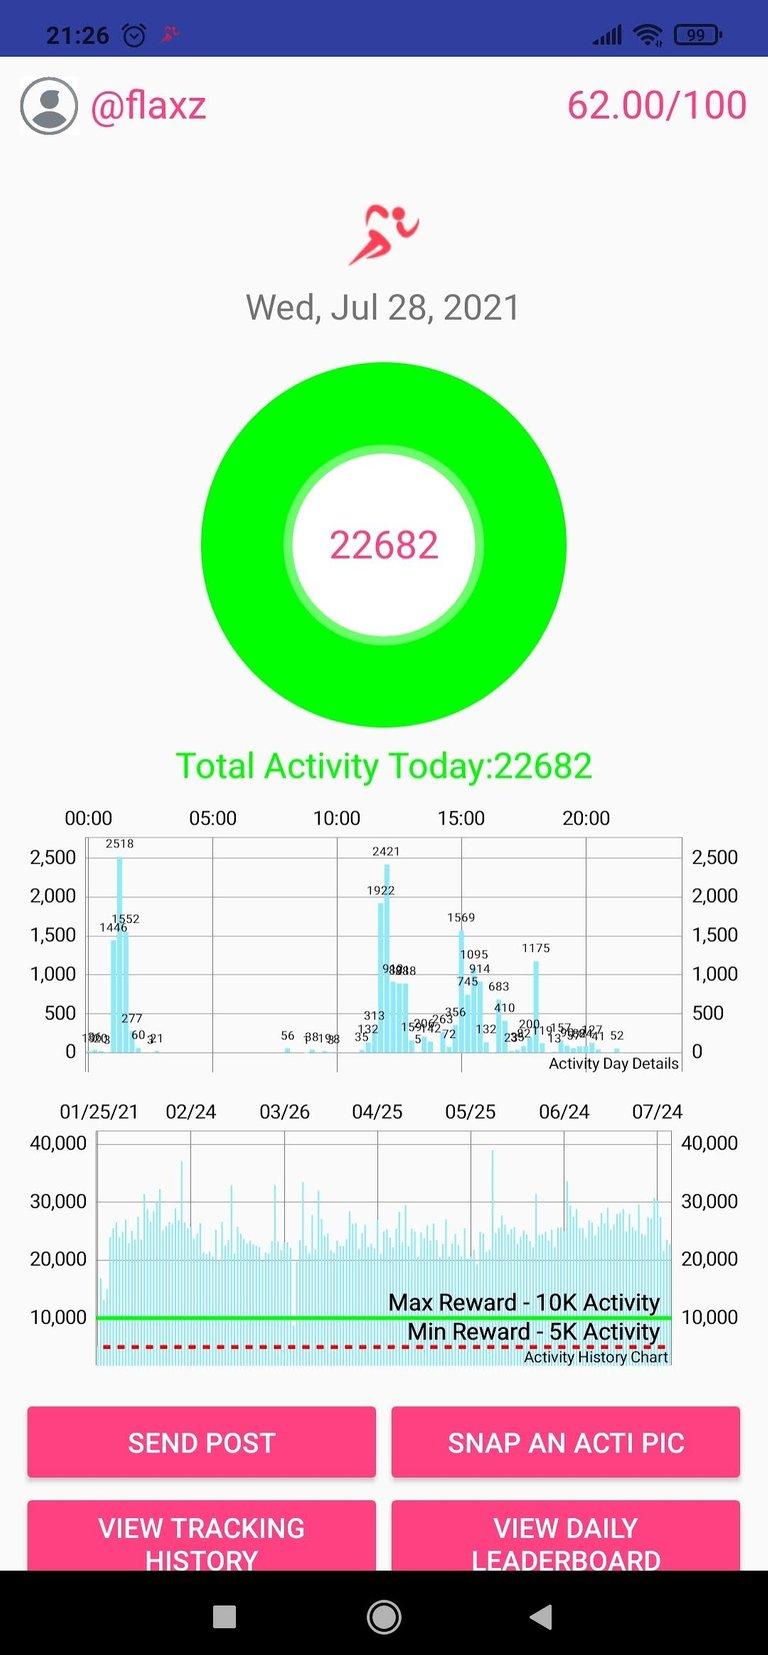 Screenshot_2021-07-28-21-26-27-292_io.actifit.fitnesstracker.actifitfitnesstracker.jpg